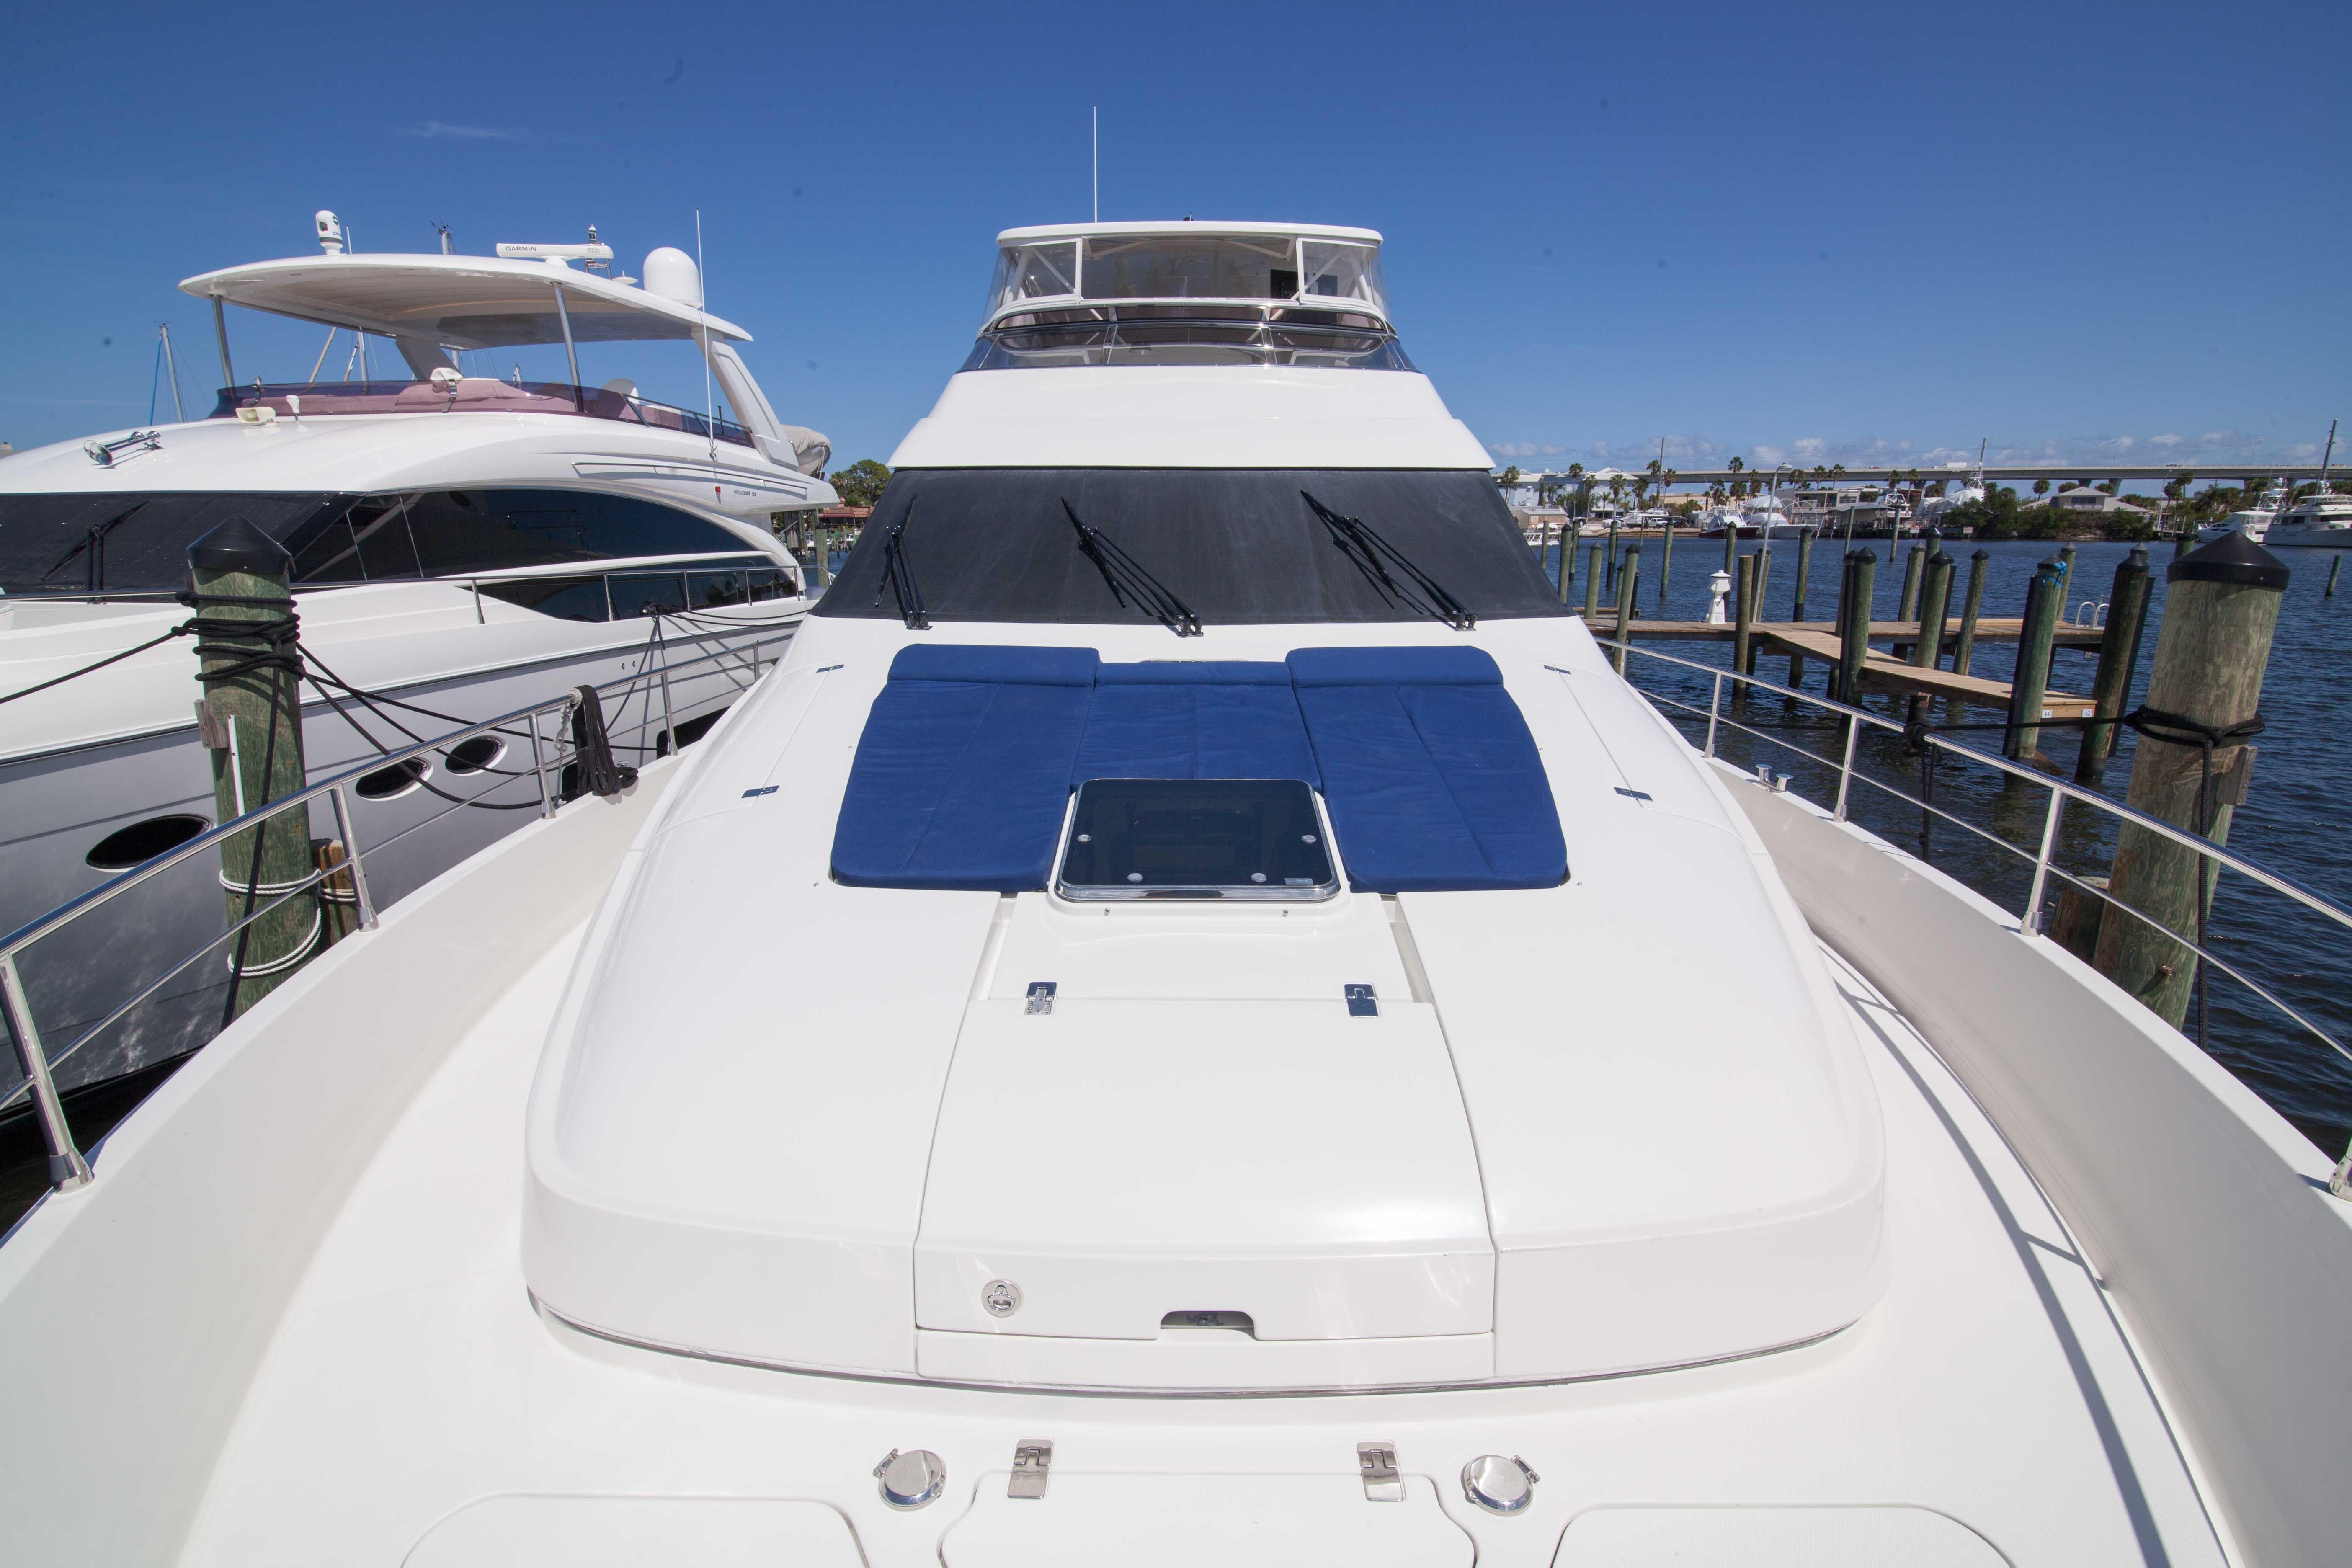 2006 Marquis Flybridge Motor Yacht Yacht For Sale In Stuart Fl Family Time